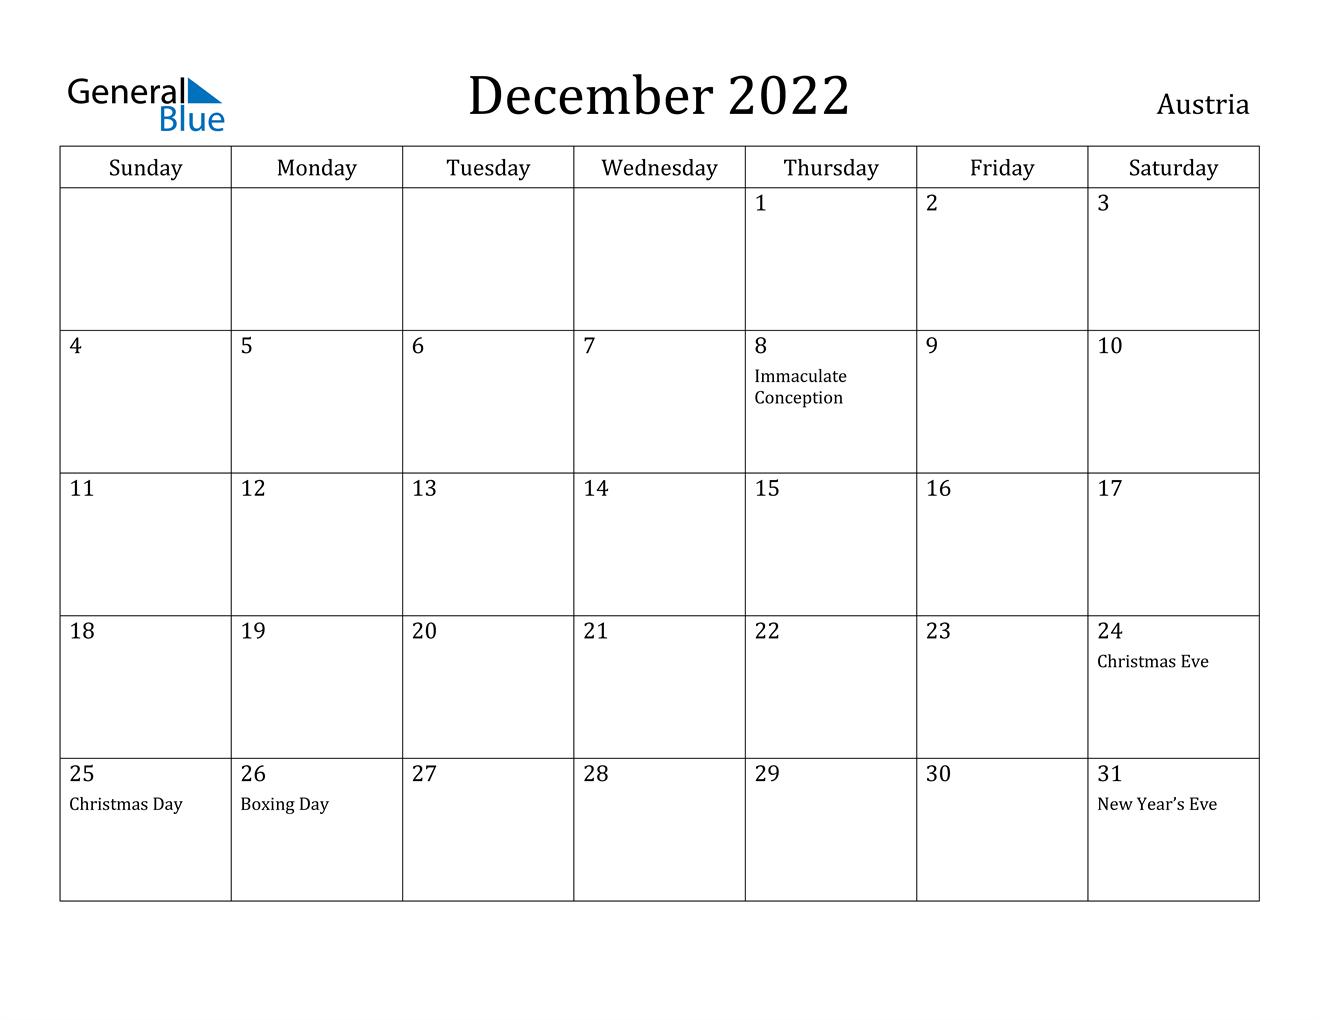 December 2022 Calendar - Austria